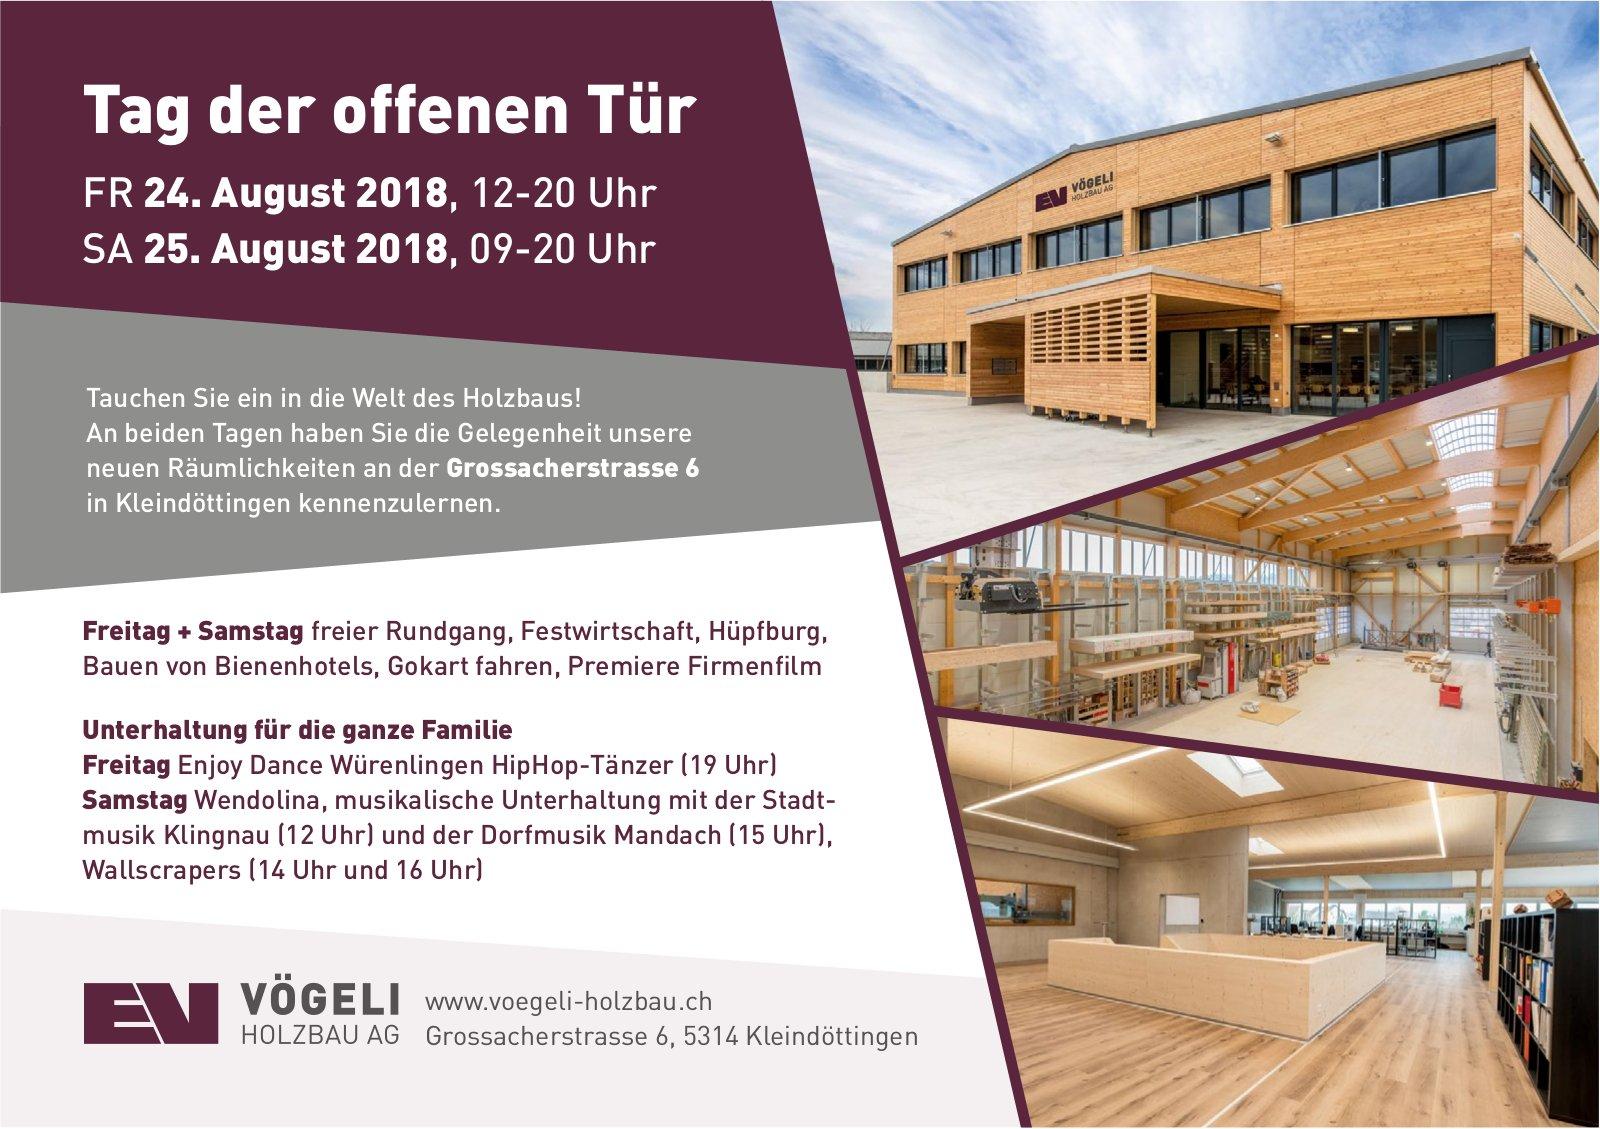 Tag der offenen Tür am 24./25. August, Vögeli Holzbau AG